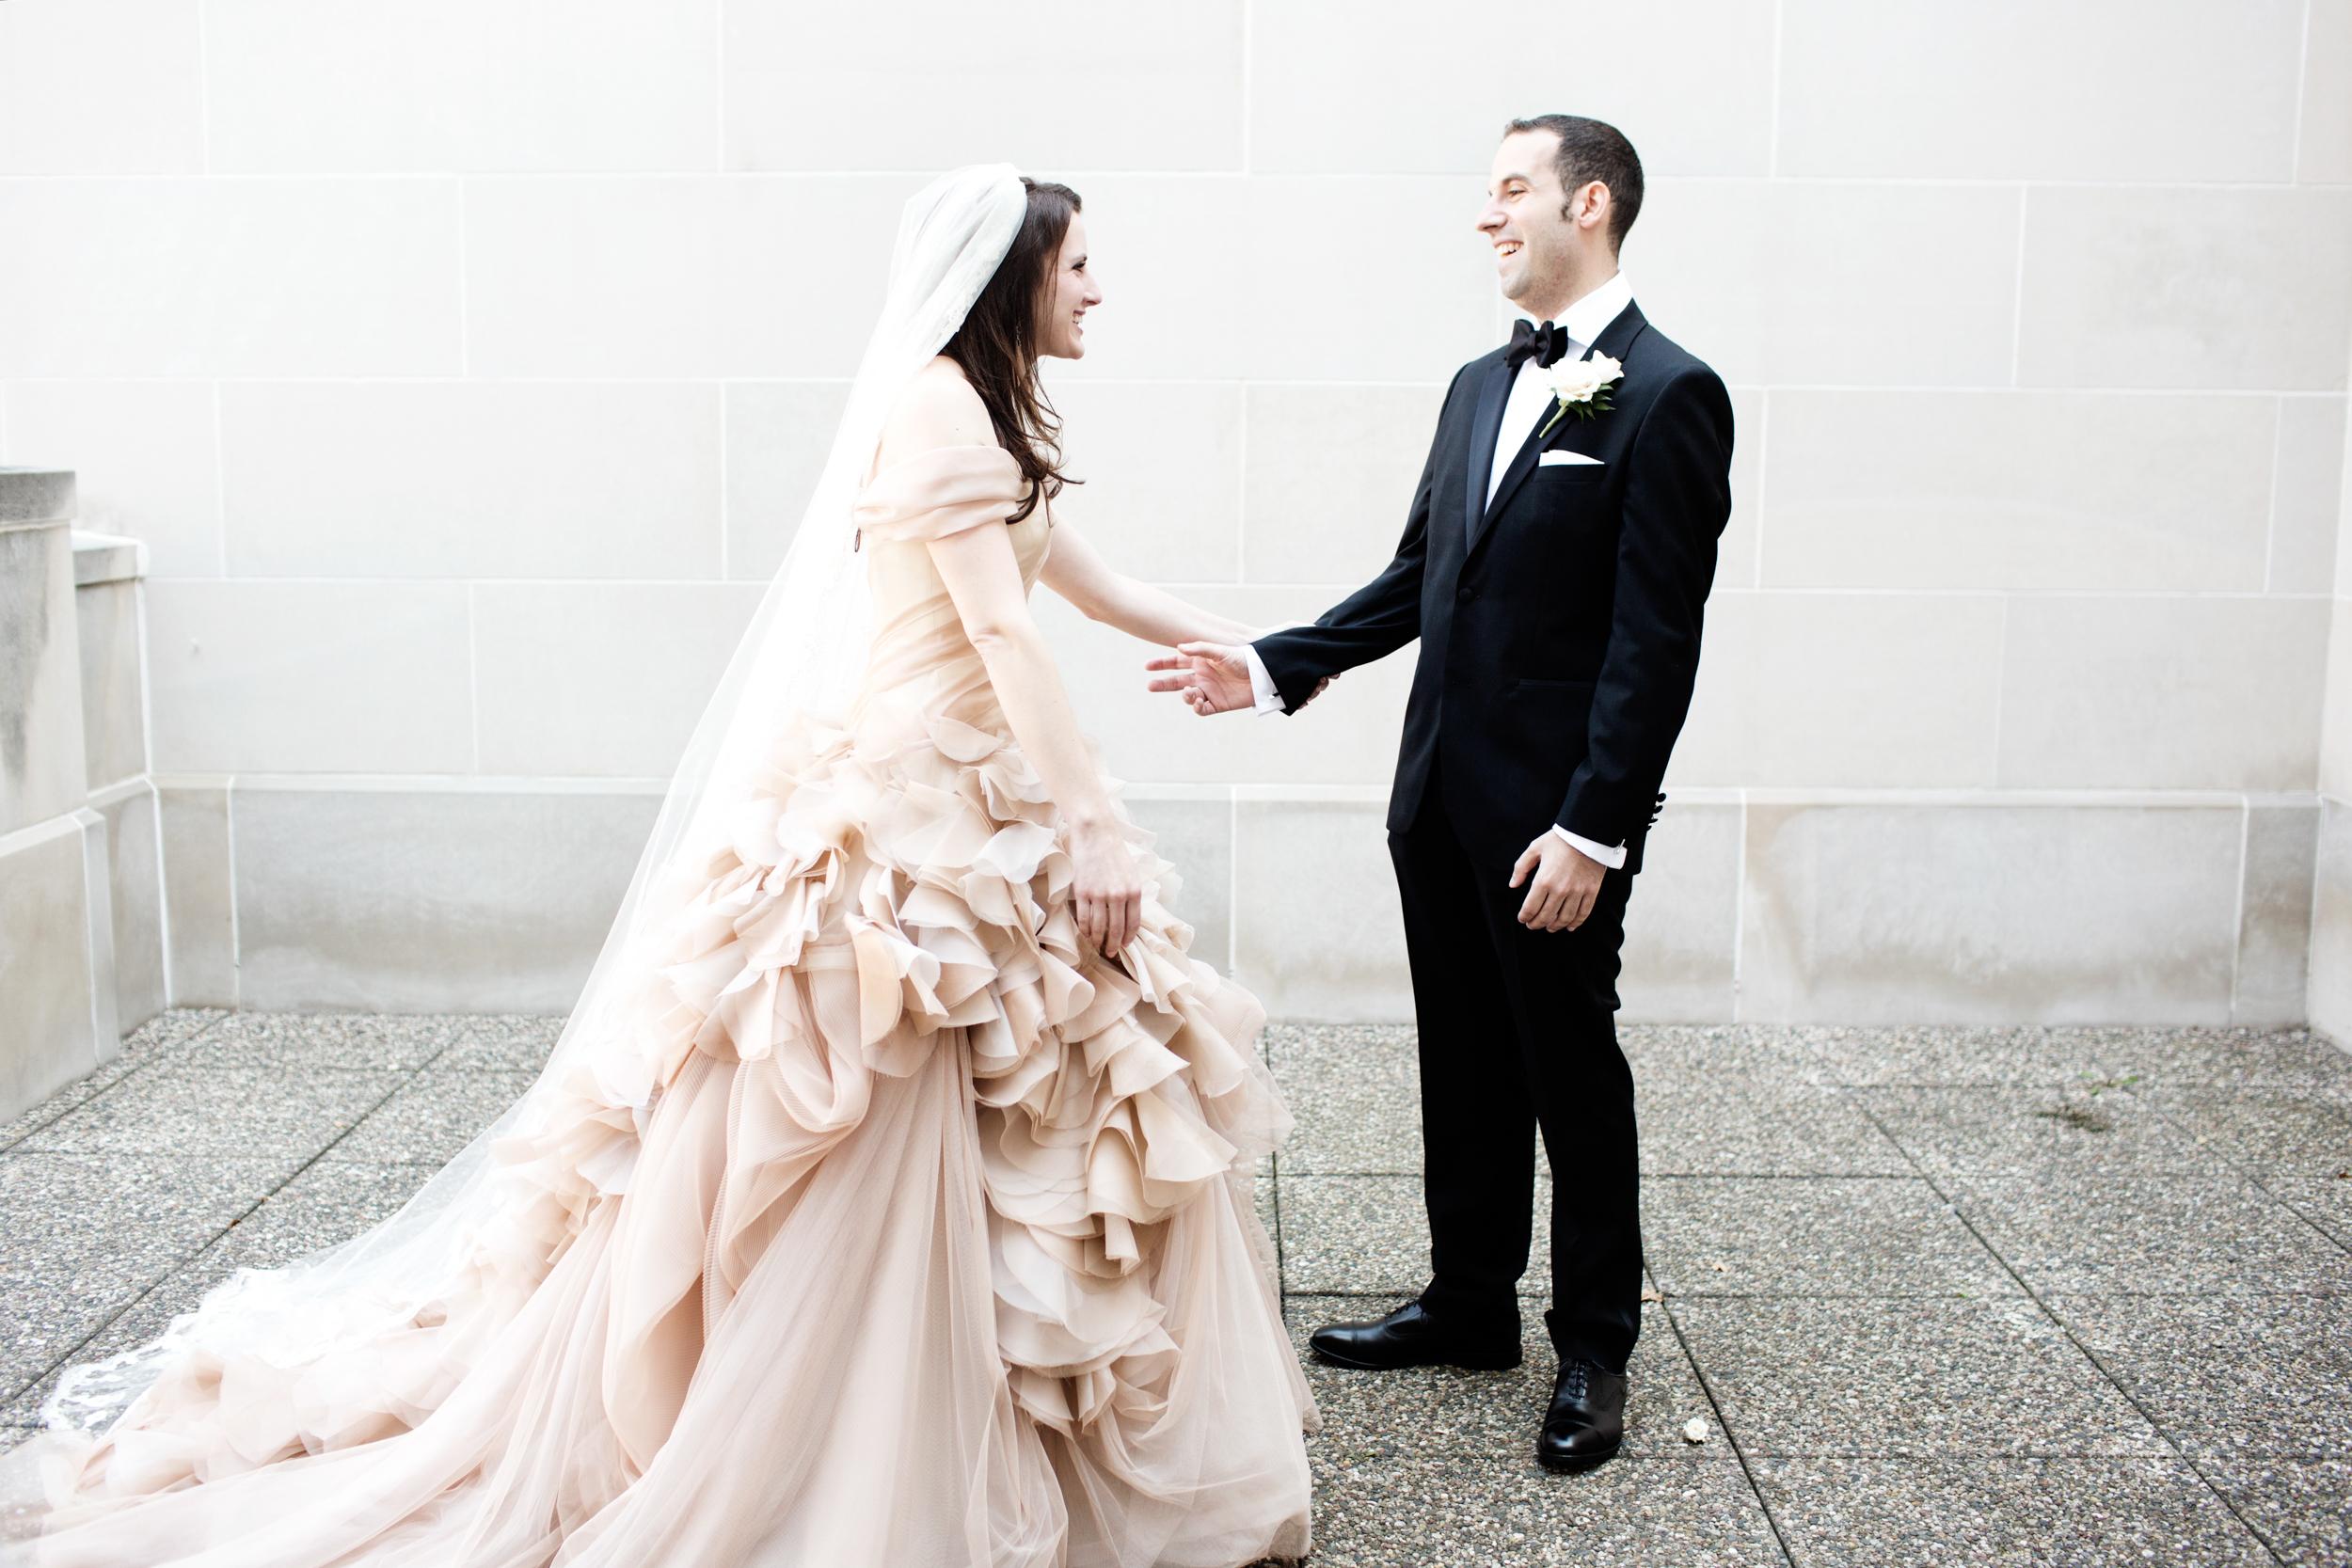 Ceci_New_York_Ceci_Style_Ceci_Johnson_Luxury_Lifestyle_Floral_Lace_Wedding_Letterpress_Inspiration_Design_Custom_Couture_Personalized_Invitations_-140.jpg